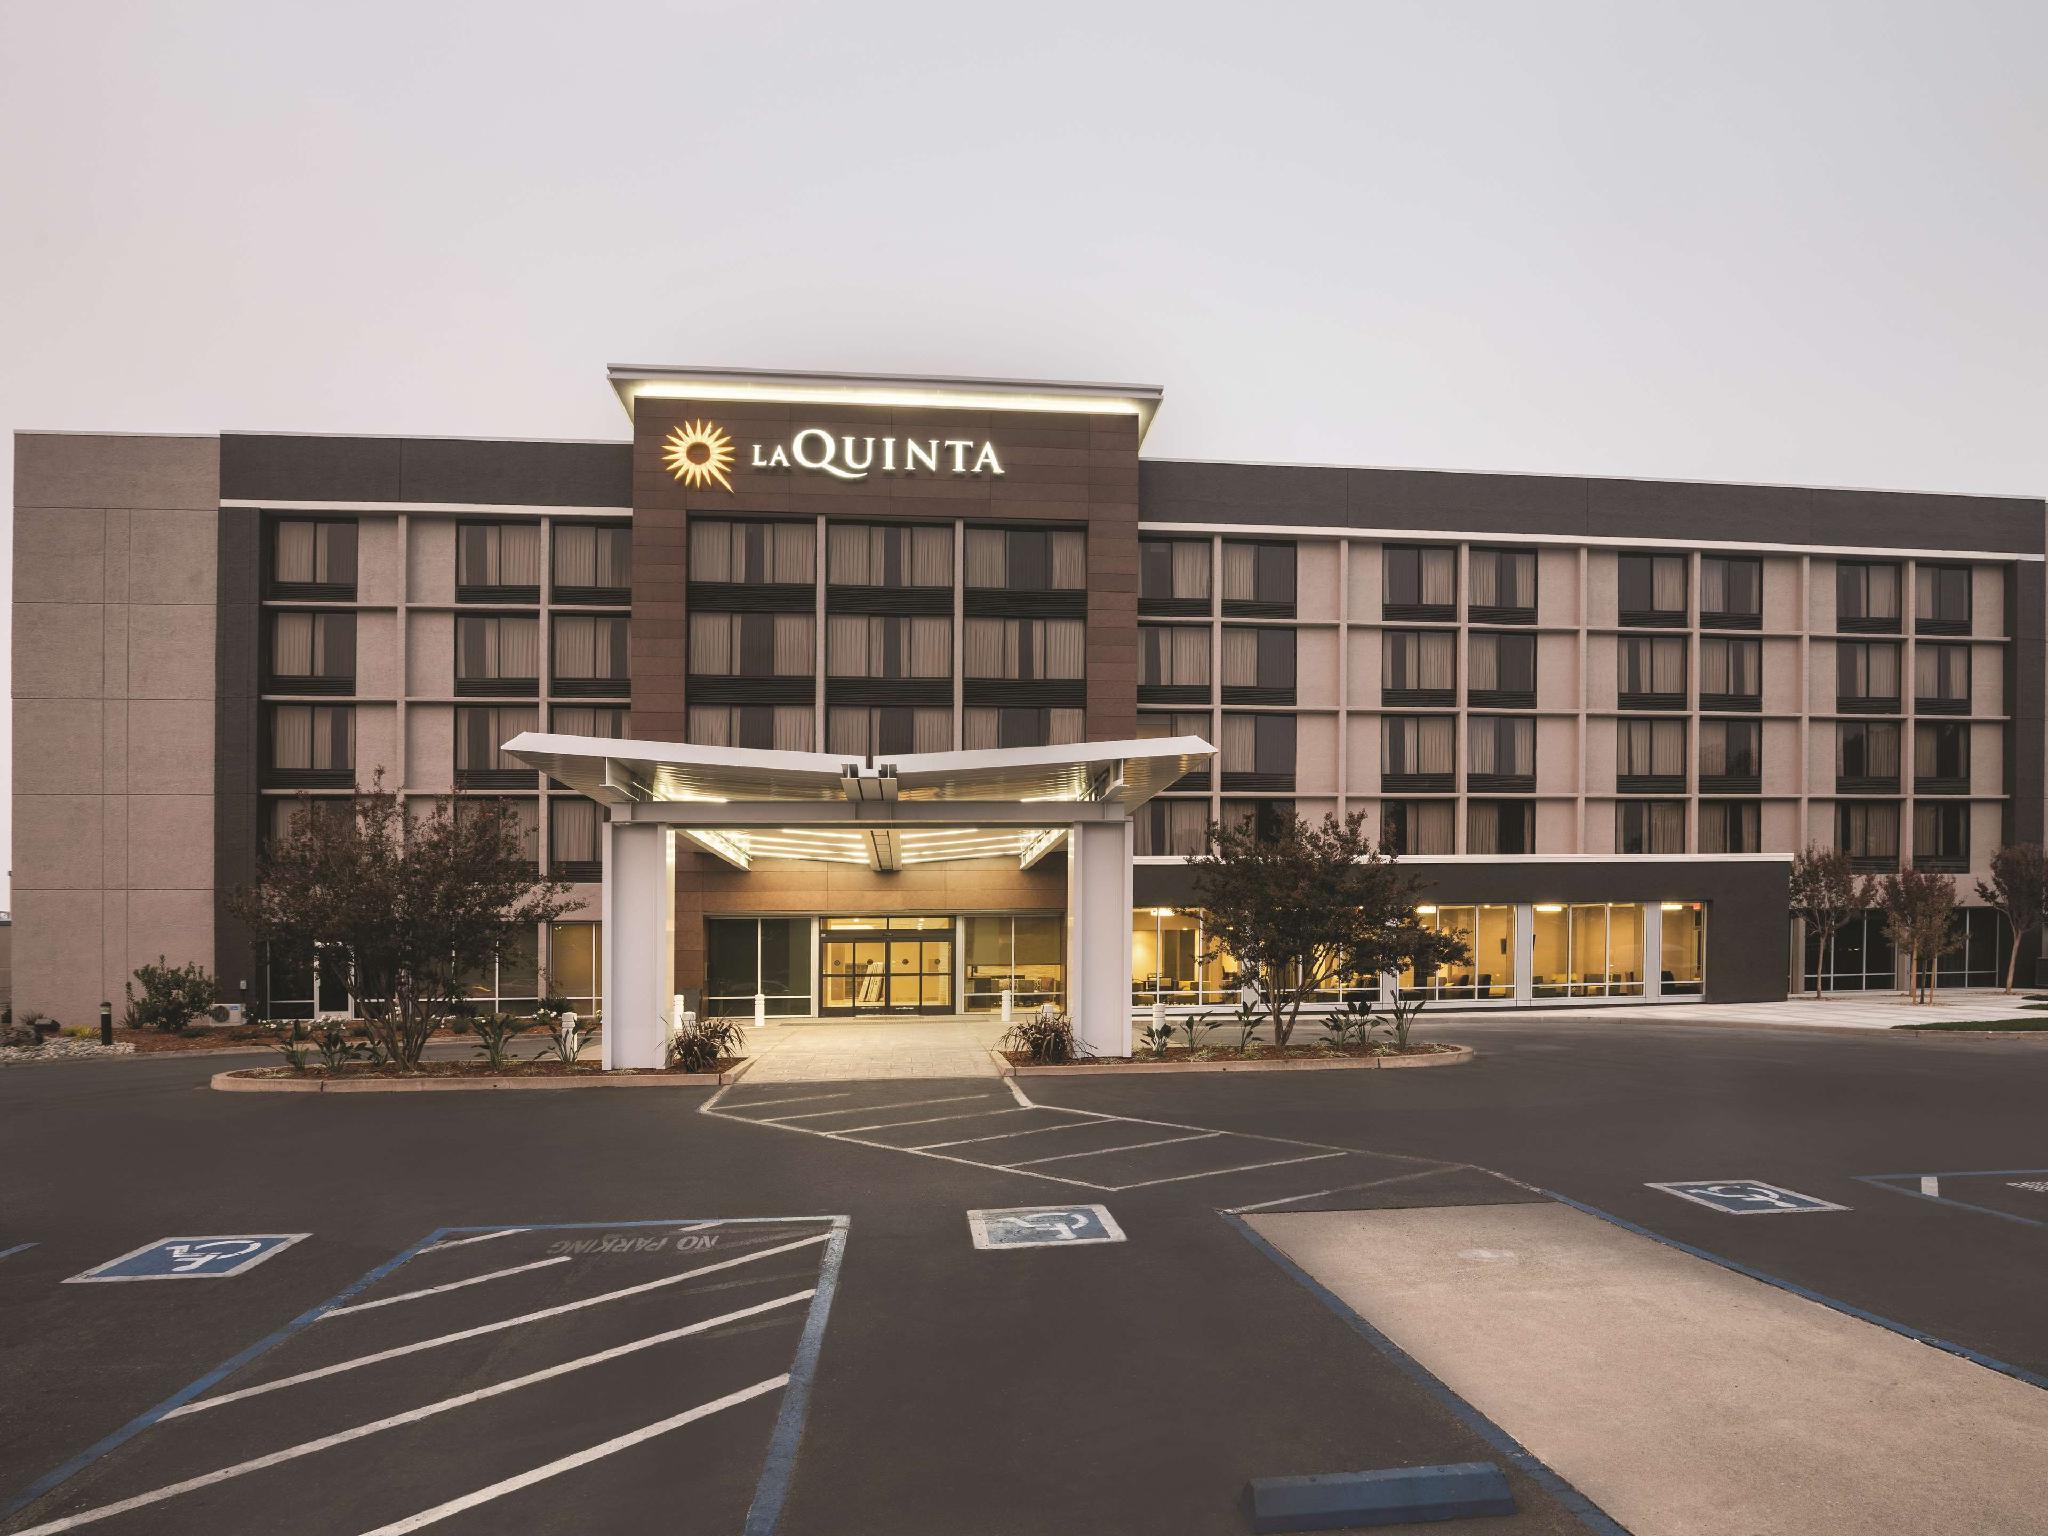 La Quinta Inn And Suites By Wyndham Rancho Cordova Sacramento